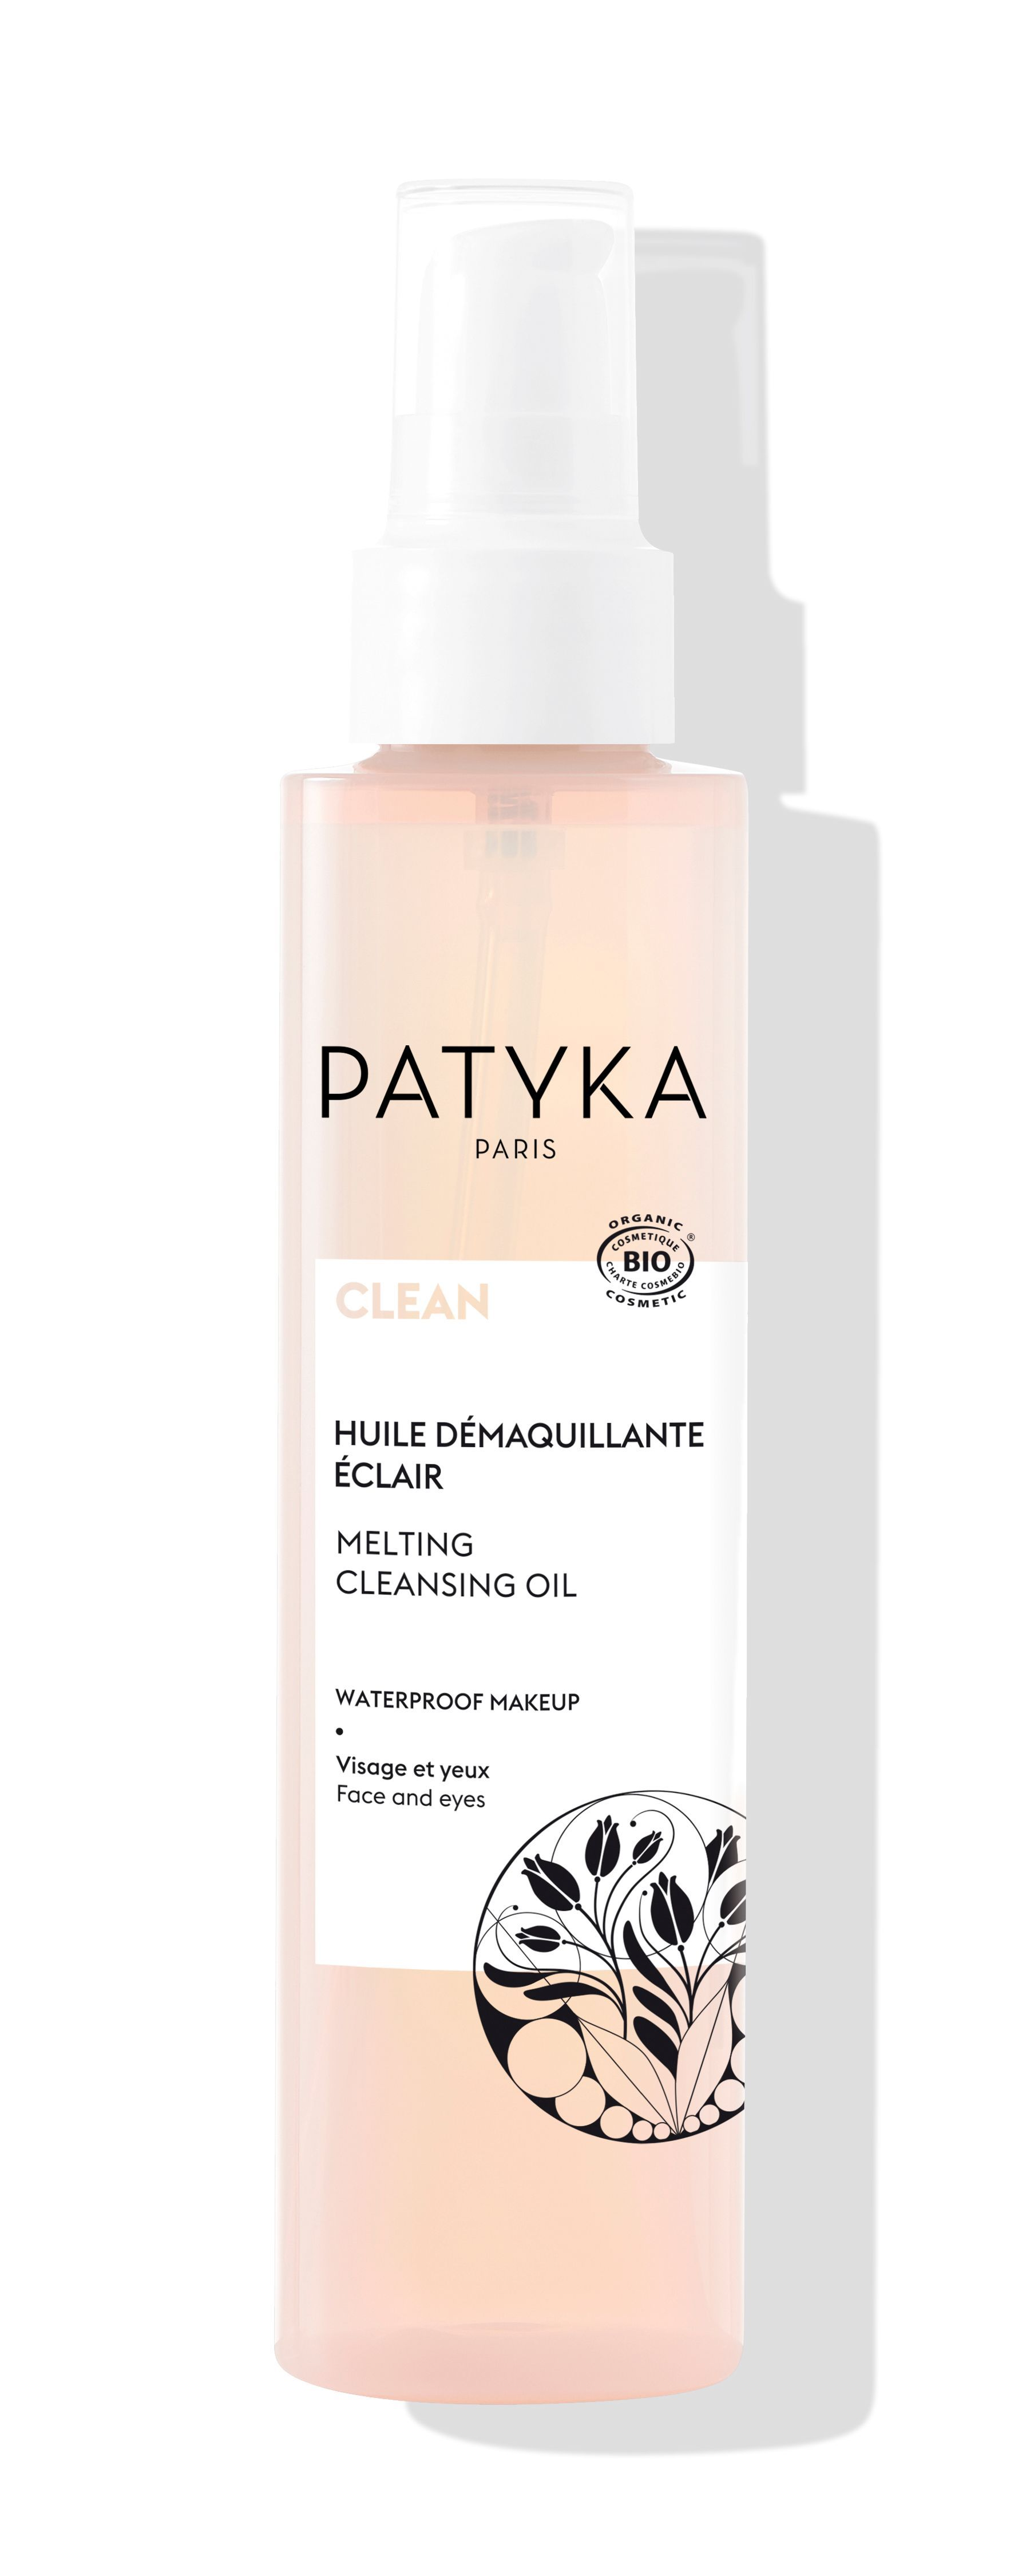 PATYKA - CLEAN - Huile Démaquillante Eclair